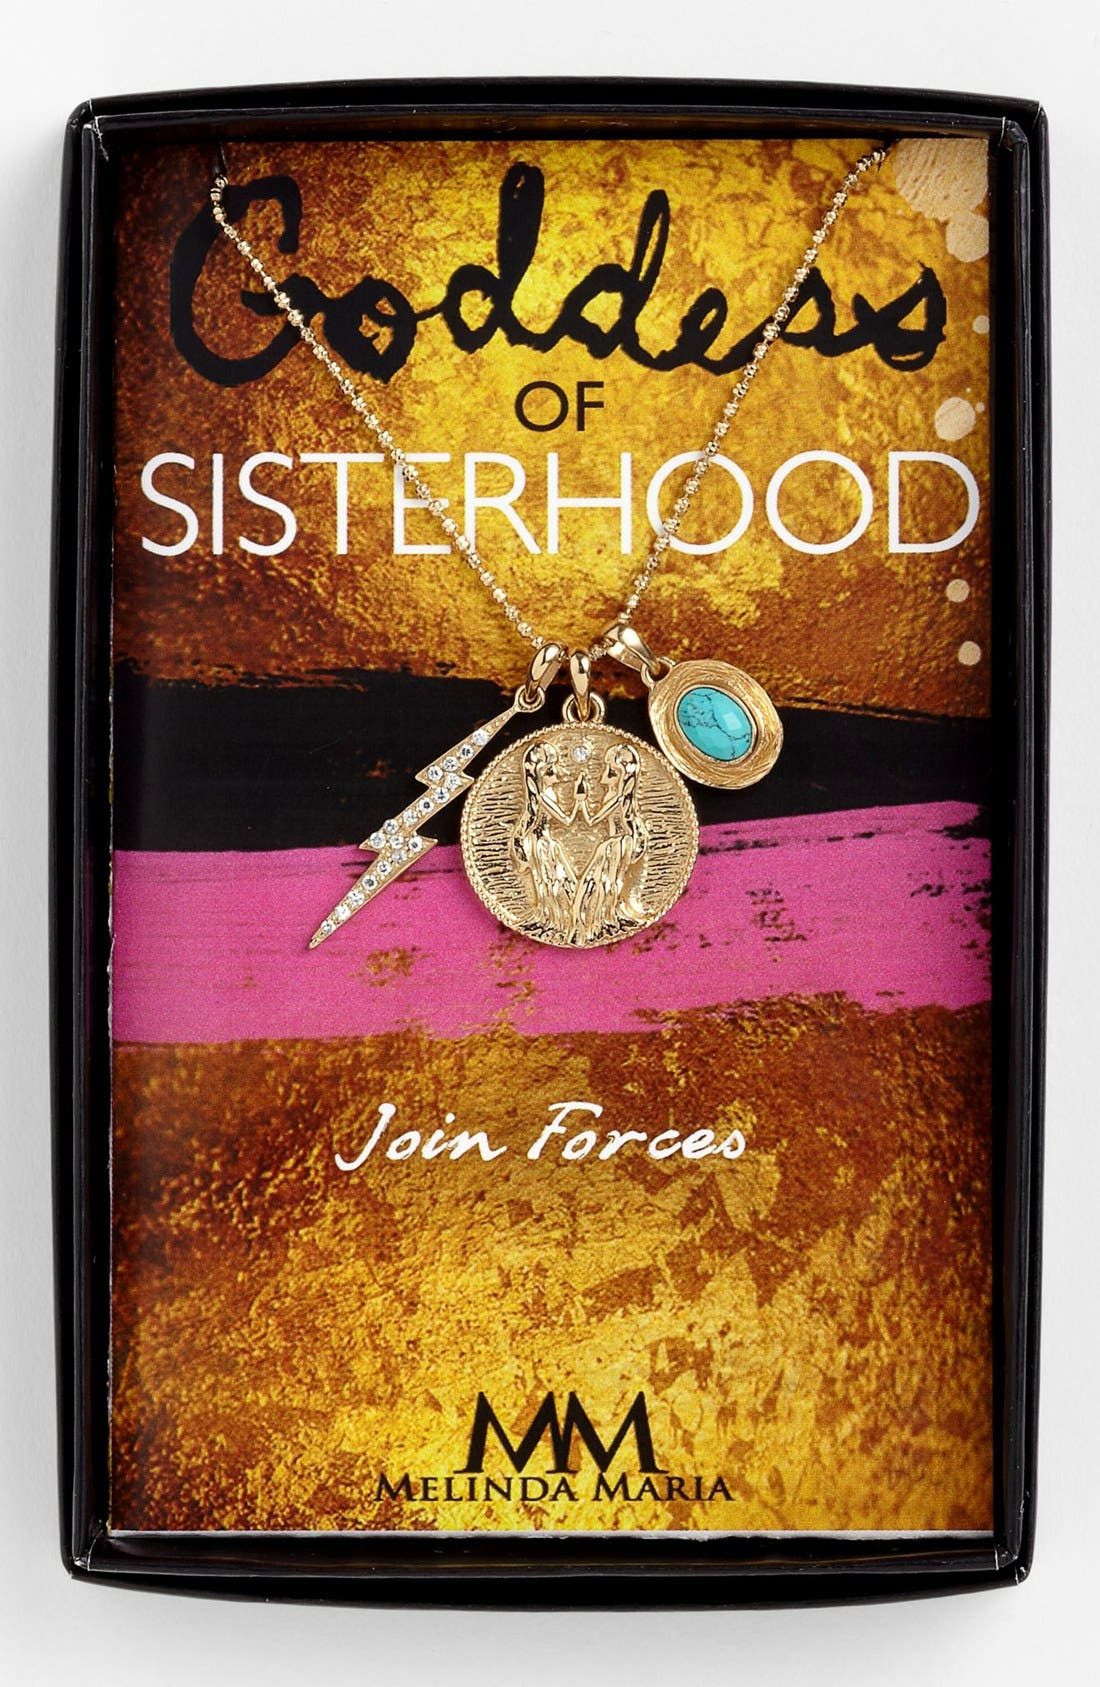 Alternate Image 1 Selected - Melinda Maria 'Goddess of Sisterhood' Cluster Pendant Necklace